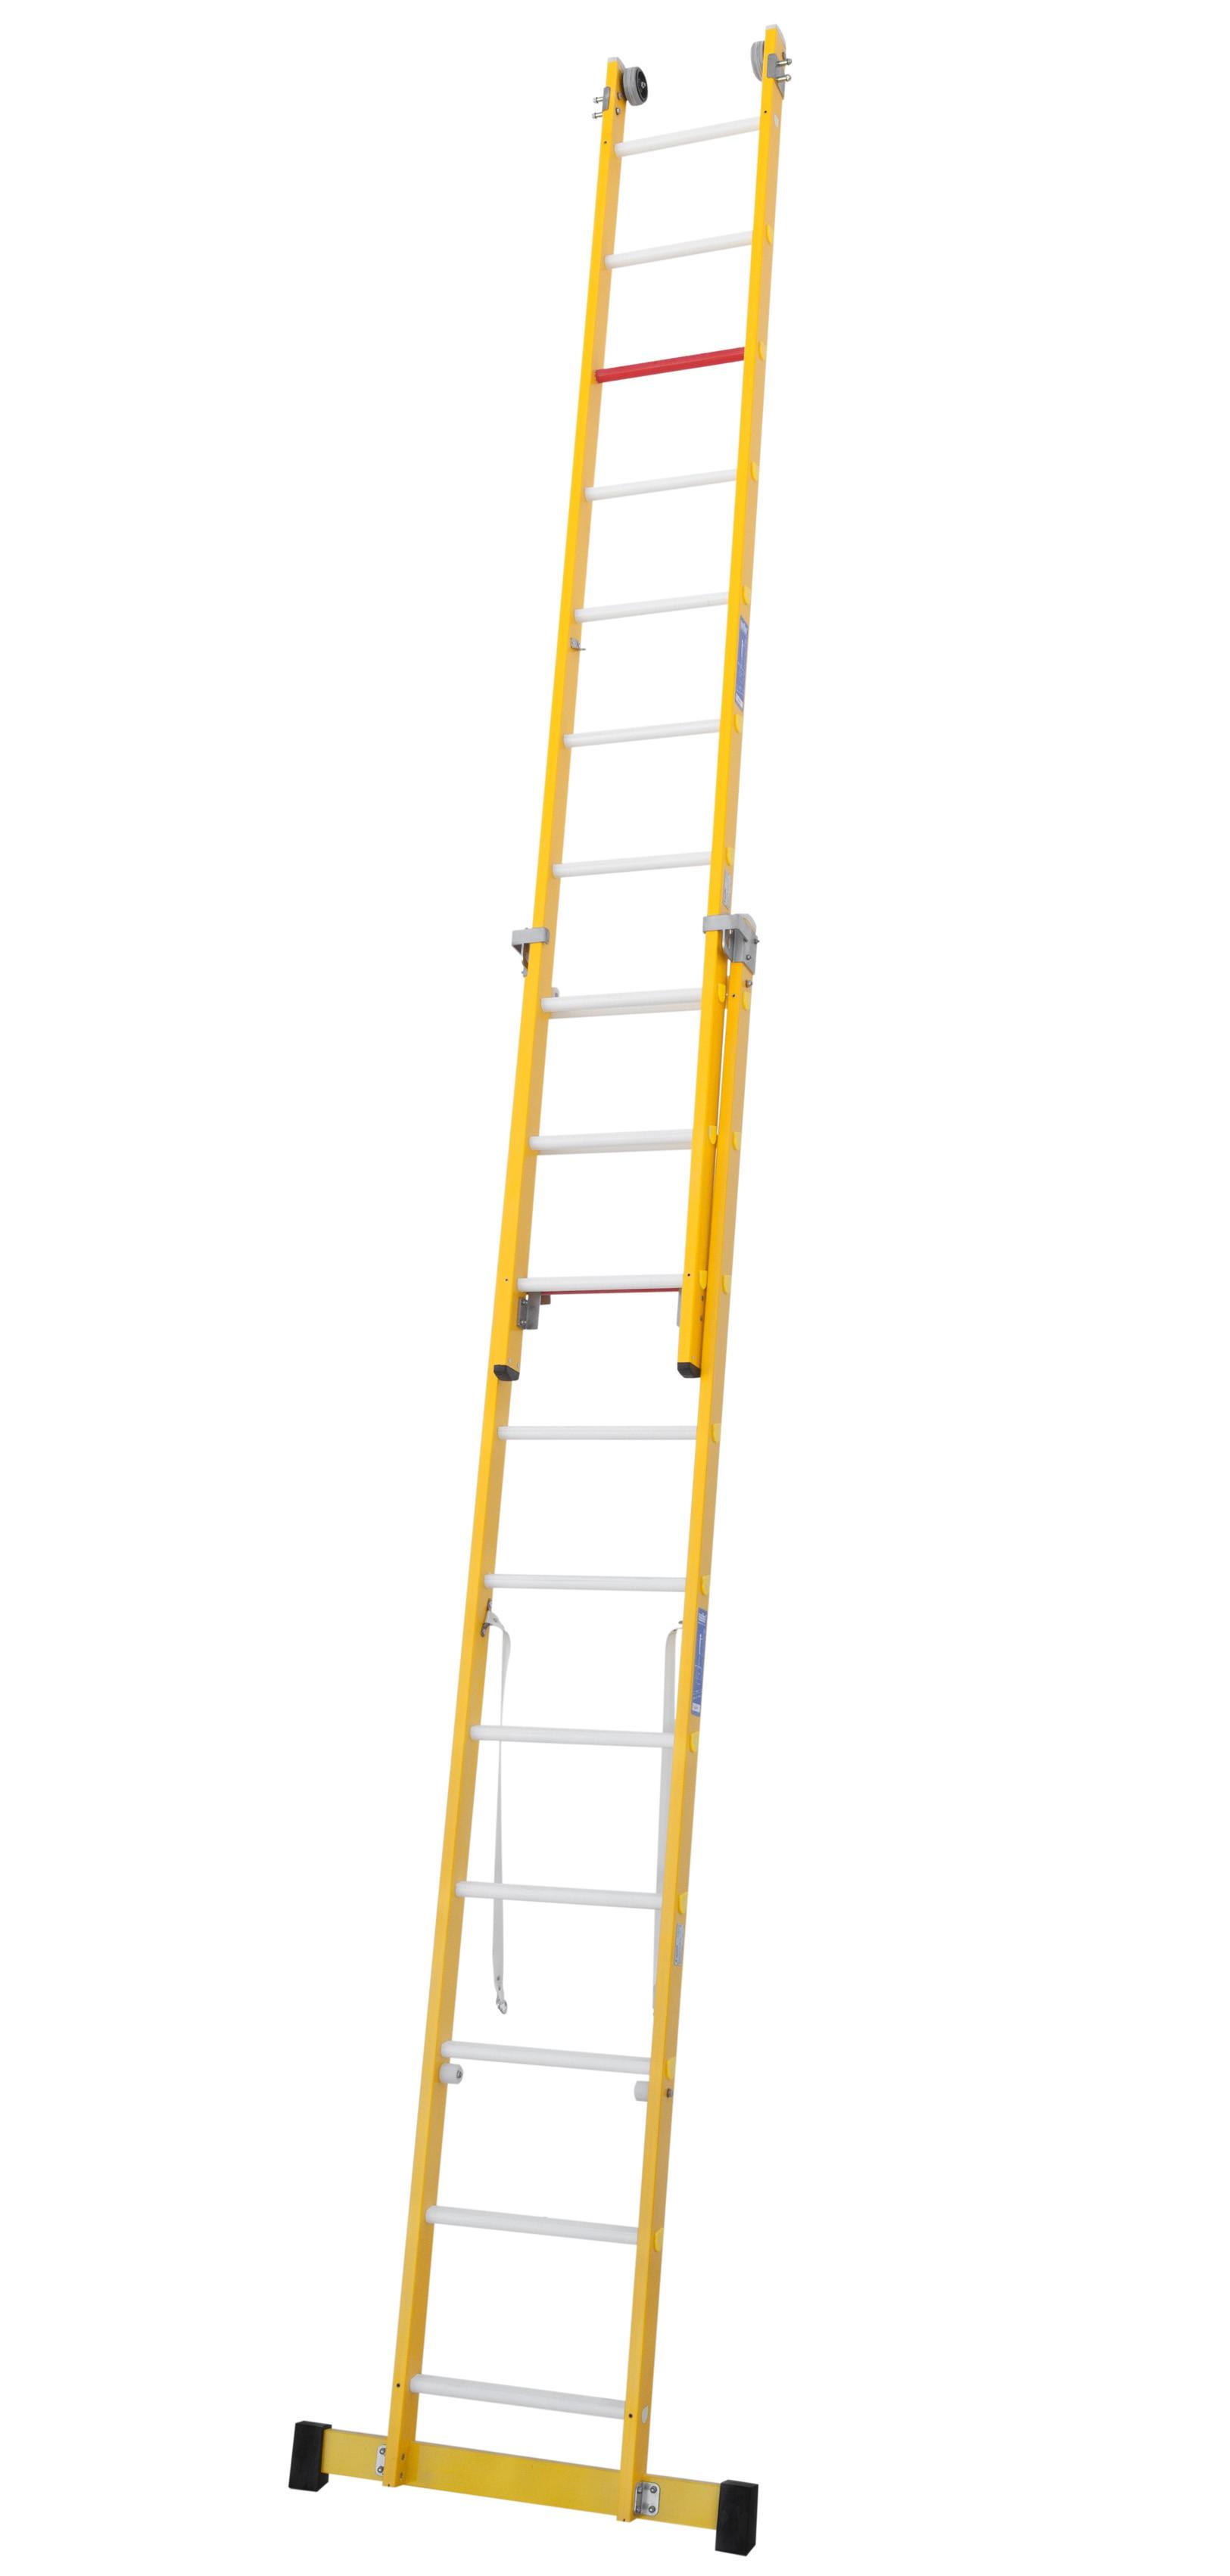 Fibreglass Multi-purpose Ladder